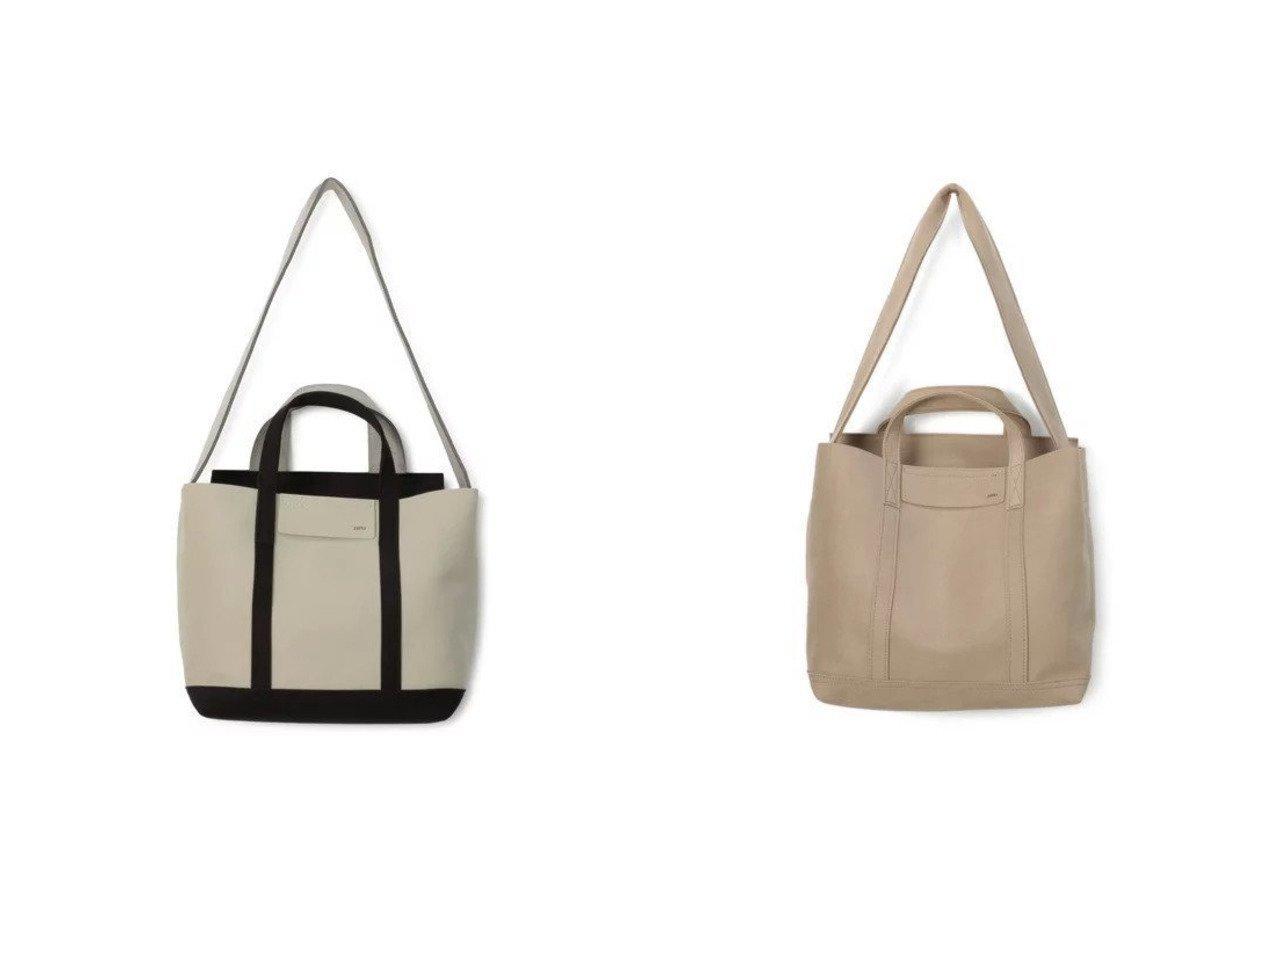 【zattu/ザッツ】のNEPPA MULTI-1&KINAX(キナックス) バッグ・鞄のおすすめ!人気、トレンド・レディースファッションの通販 おすすめで人気の流行・トレンド、ファッションの通販商品 メンズファッション・キッズファッション・インテリア・家具・レディースファッション・服の通販 founy(ファニー) https://founy.com/ ファッション Fashion レディースファッション WOMEN バッグ Bag フラップ フロント シンプル |ID:crp329100000016324